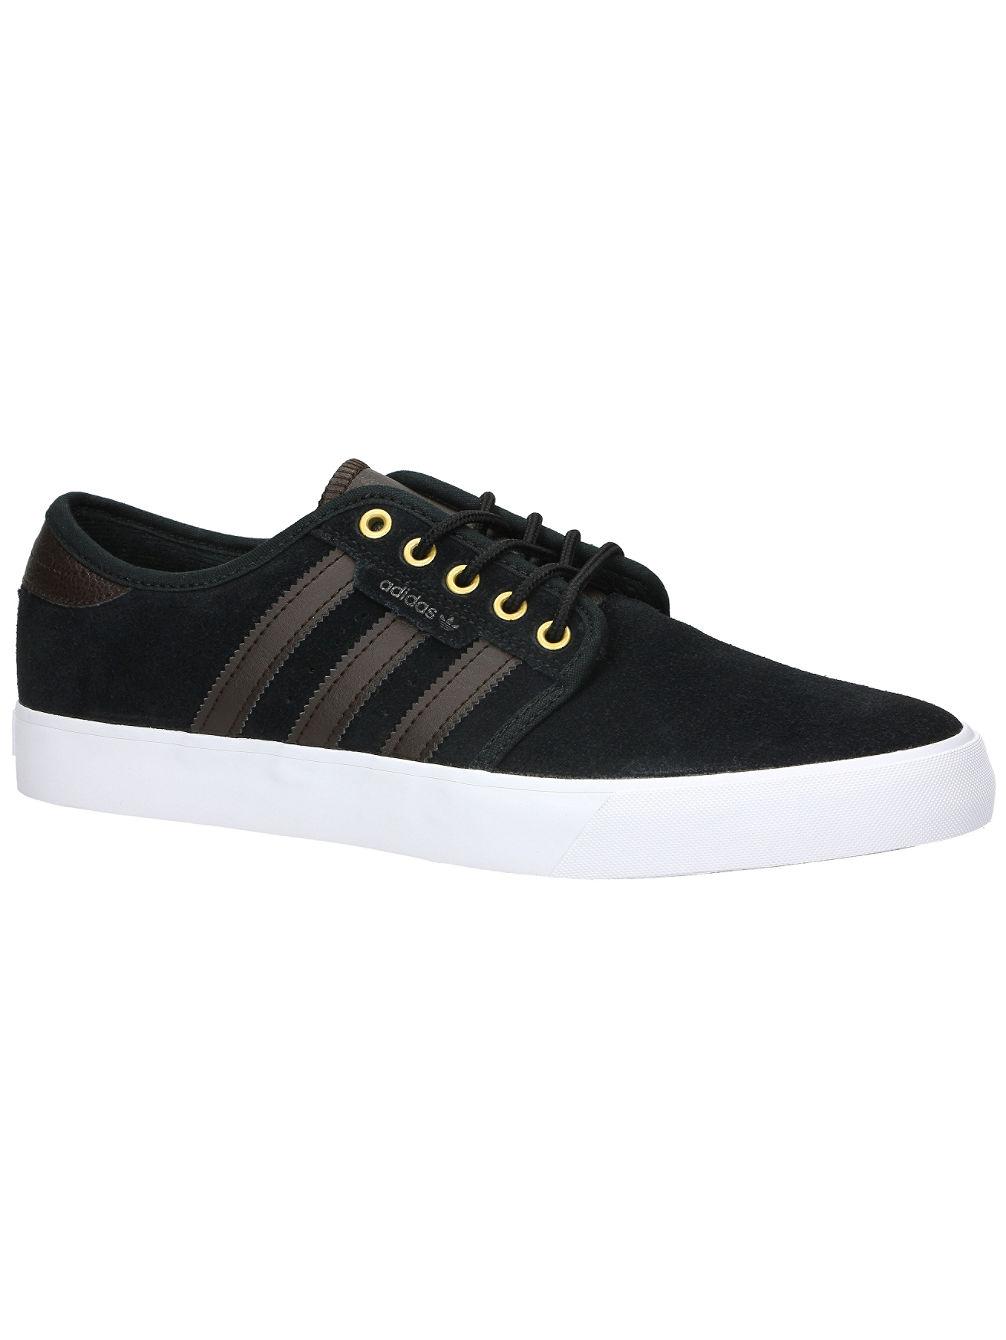 adidas-skateboarding-seeley-skate-shoes